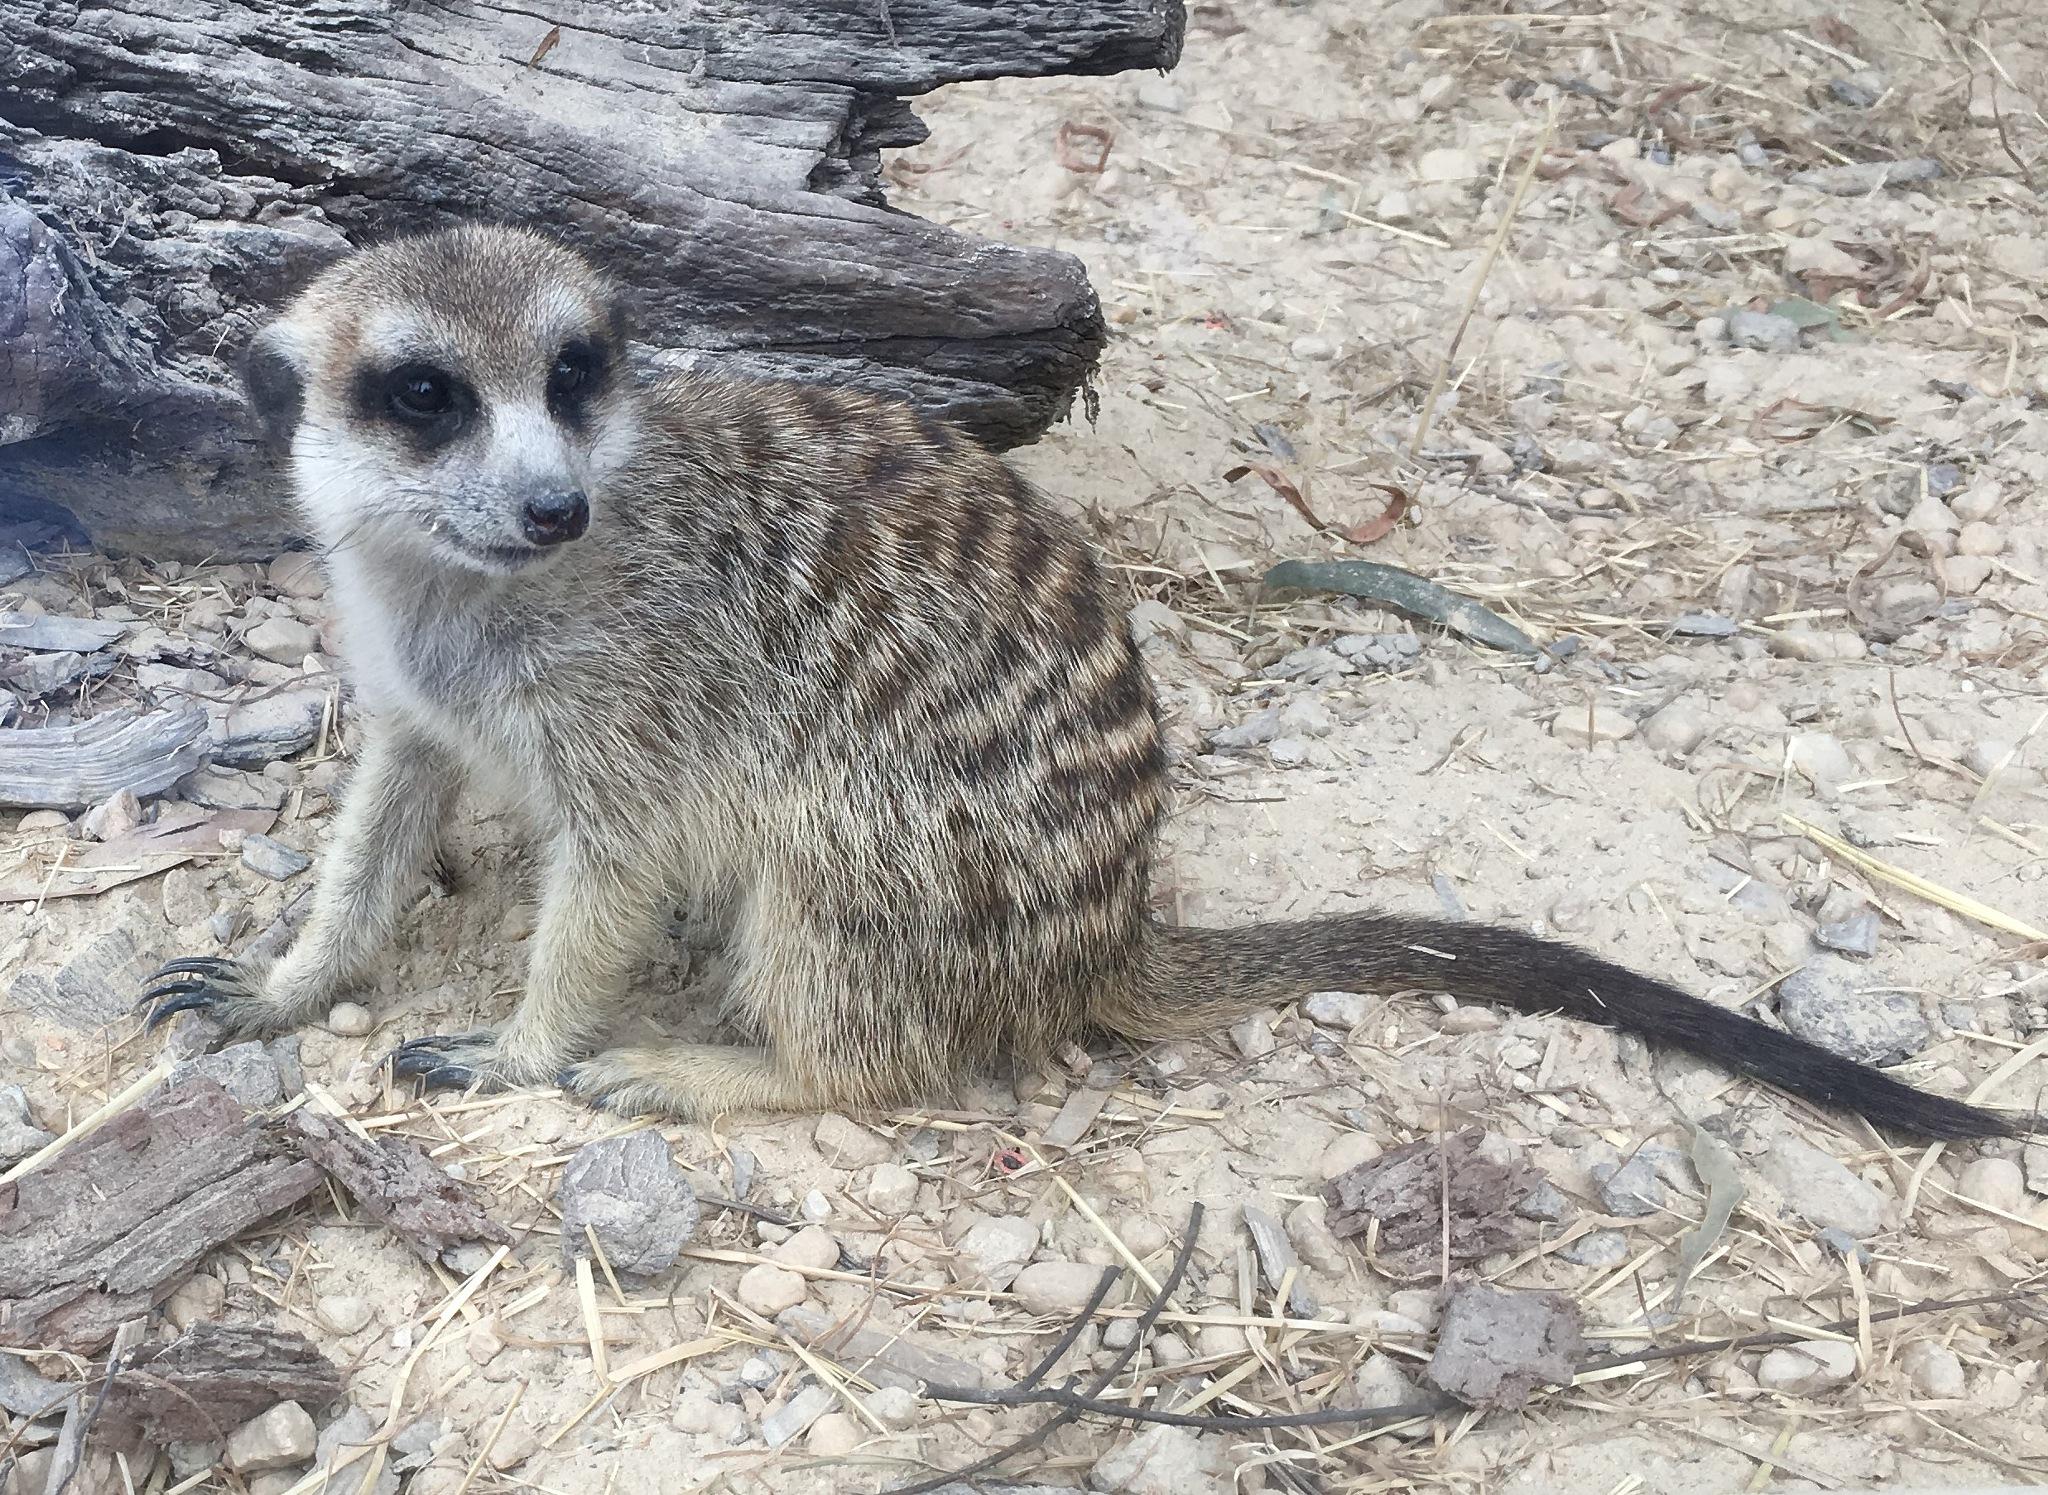 A Meerkat by ronmac777